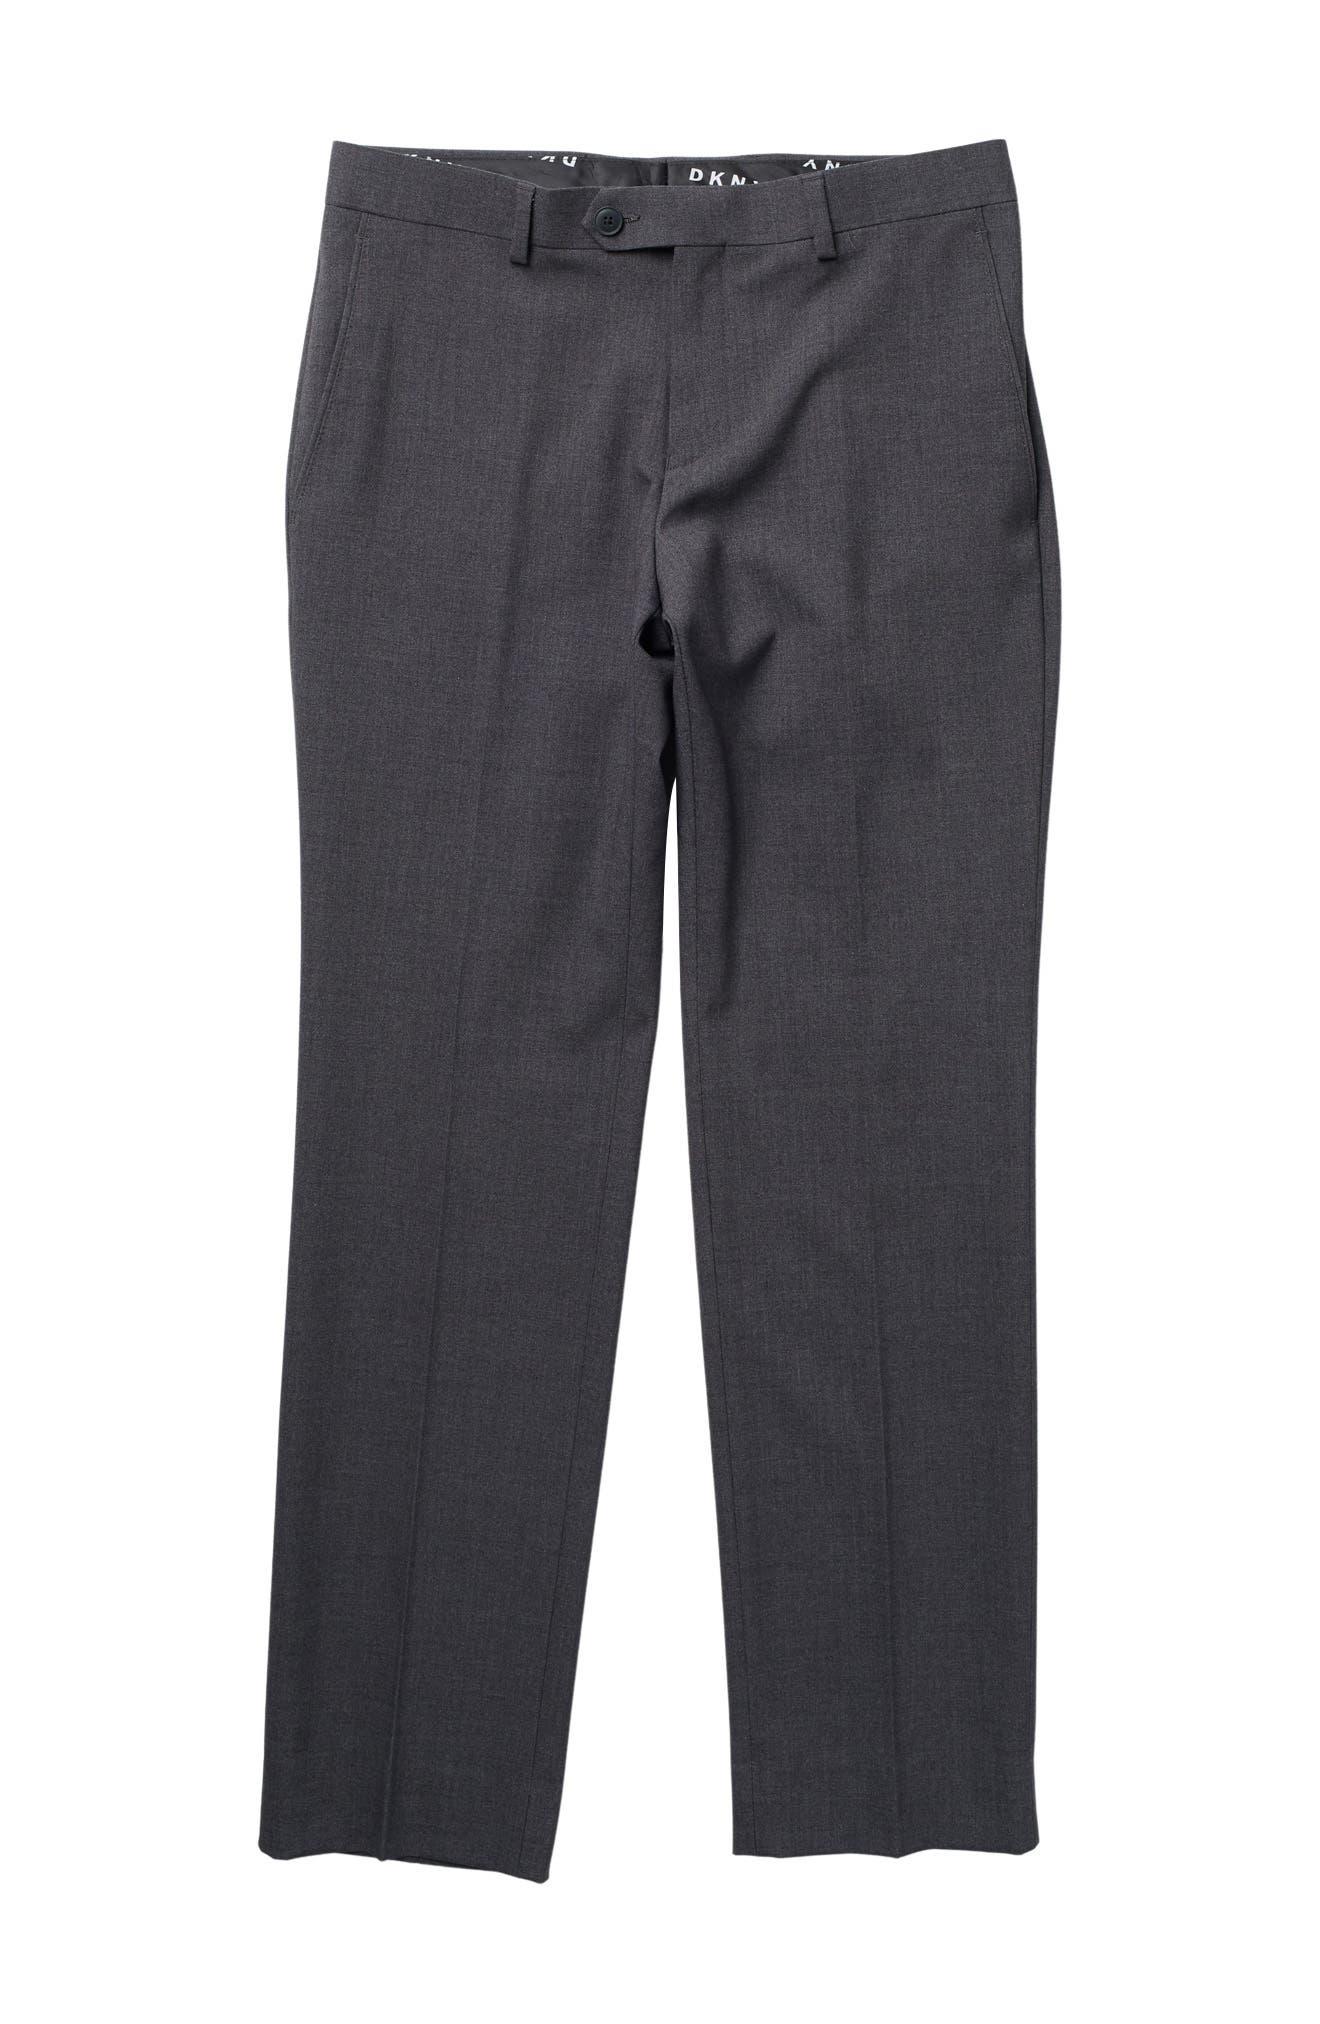 Image of DKNY Plain Stretch Dress Pants